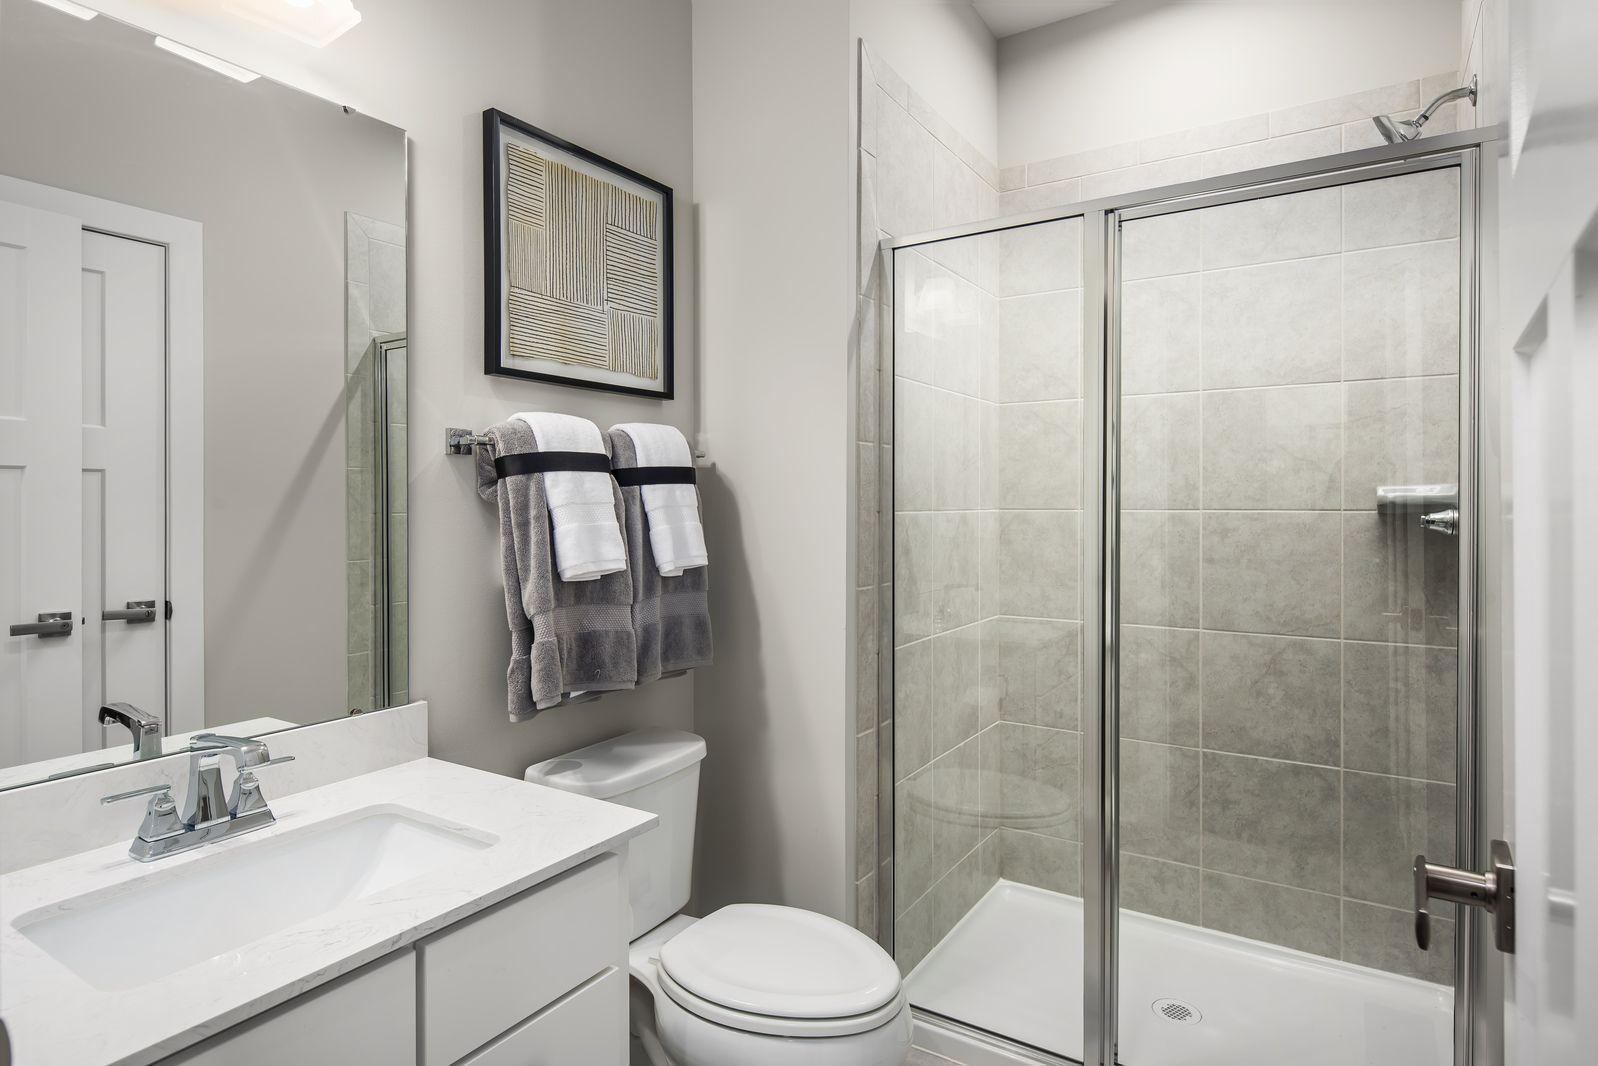 Bathroom featured in the Seneca By Ryan Homes in Washington, VA